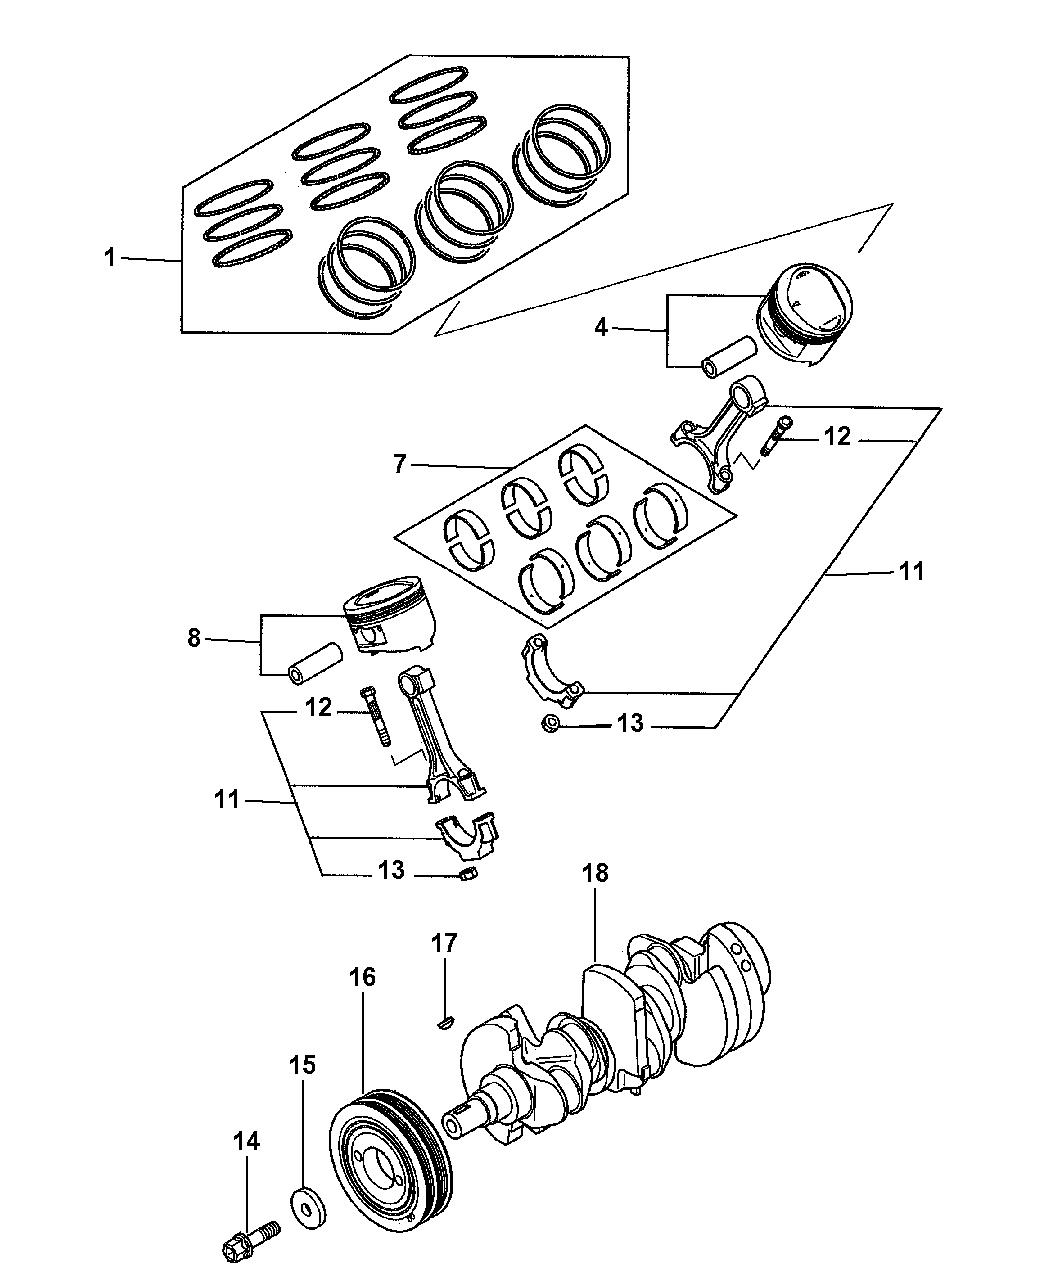 1999 Dodge Avenger Crankshaft Piston Drive Plate Engine Diagram Thumbnail 2